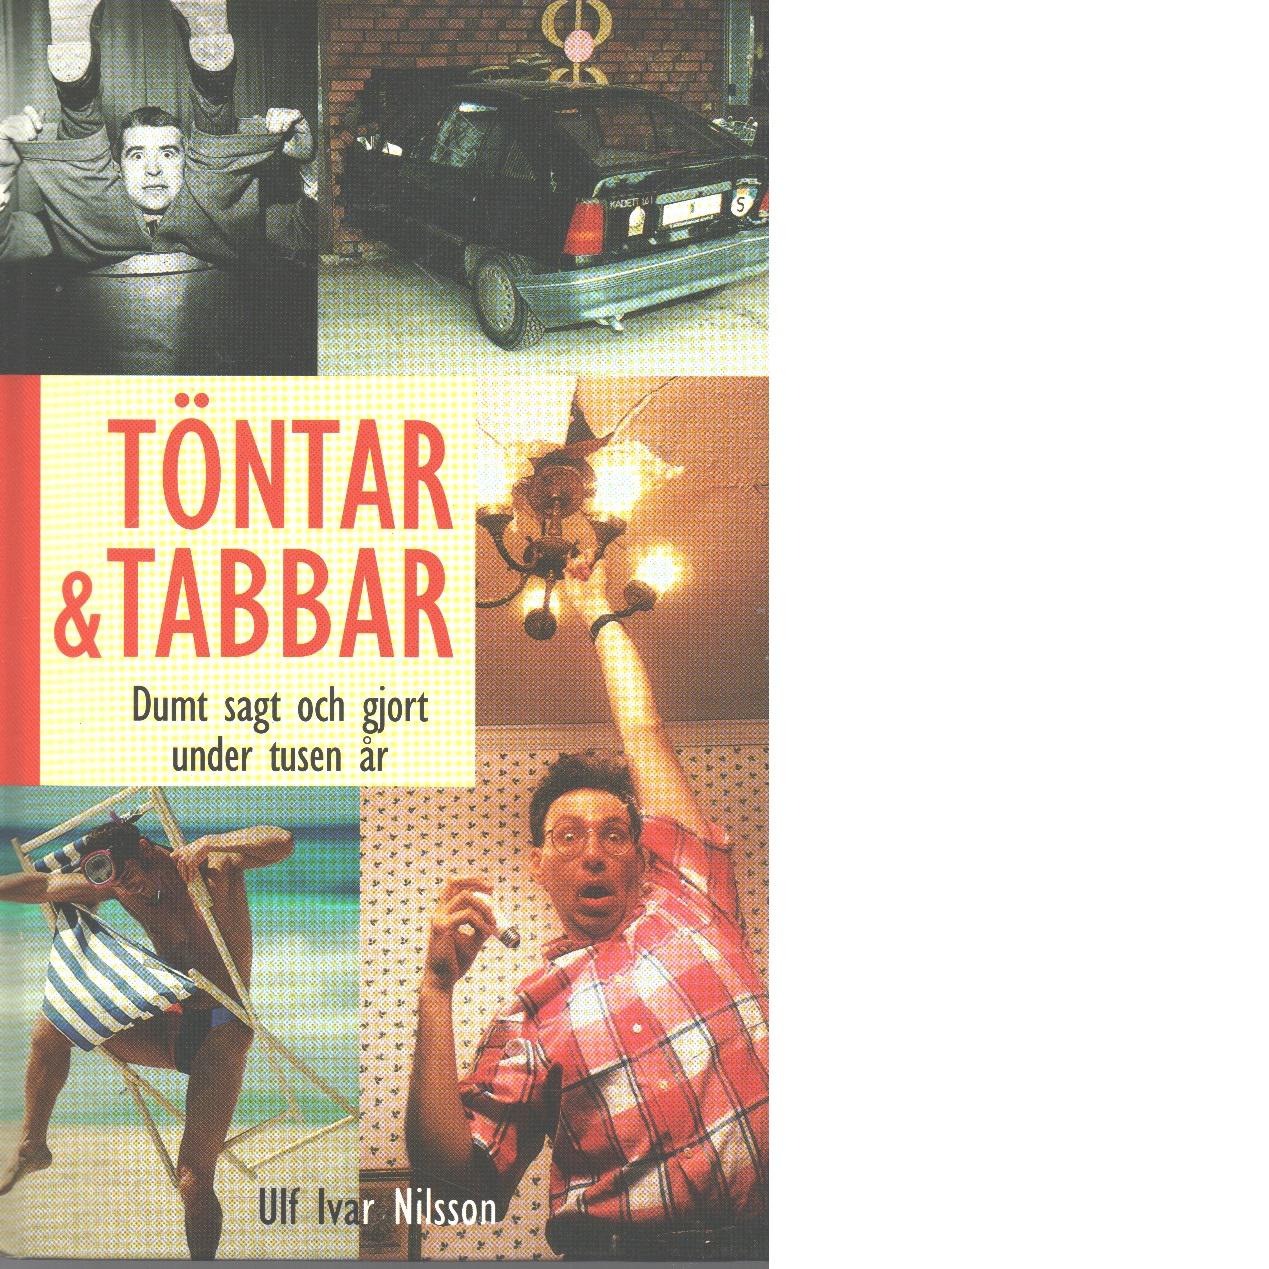 Töntar & tabbar - Nilsson, Ulf Ivar,